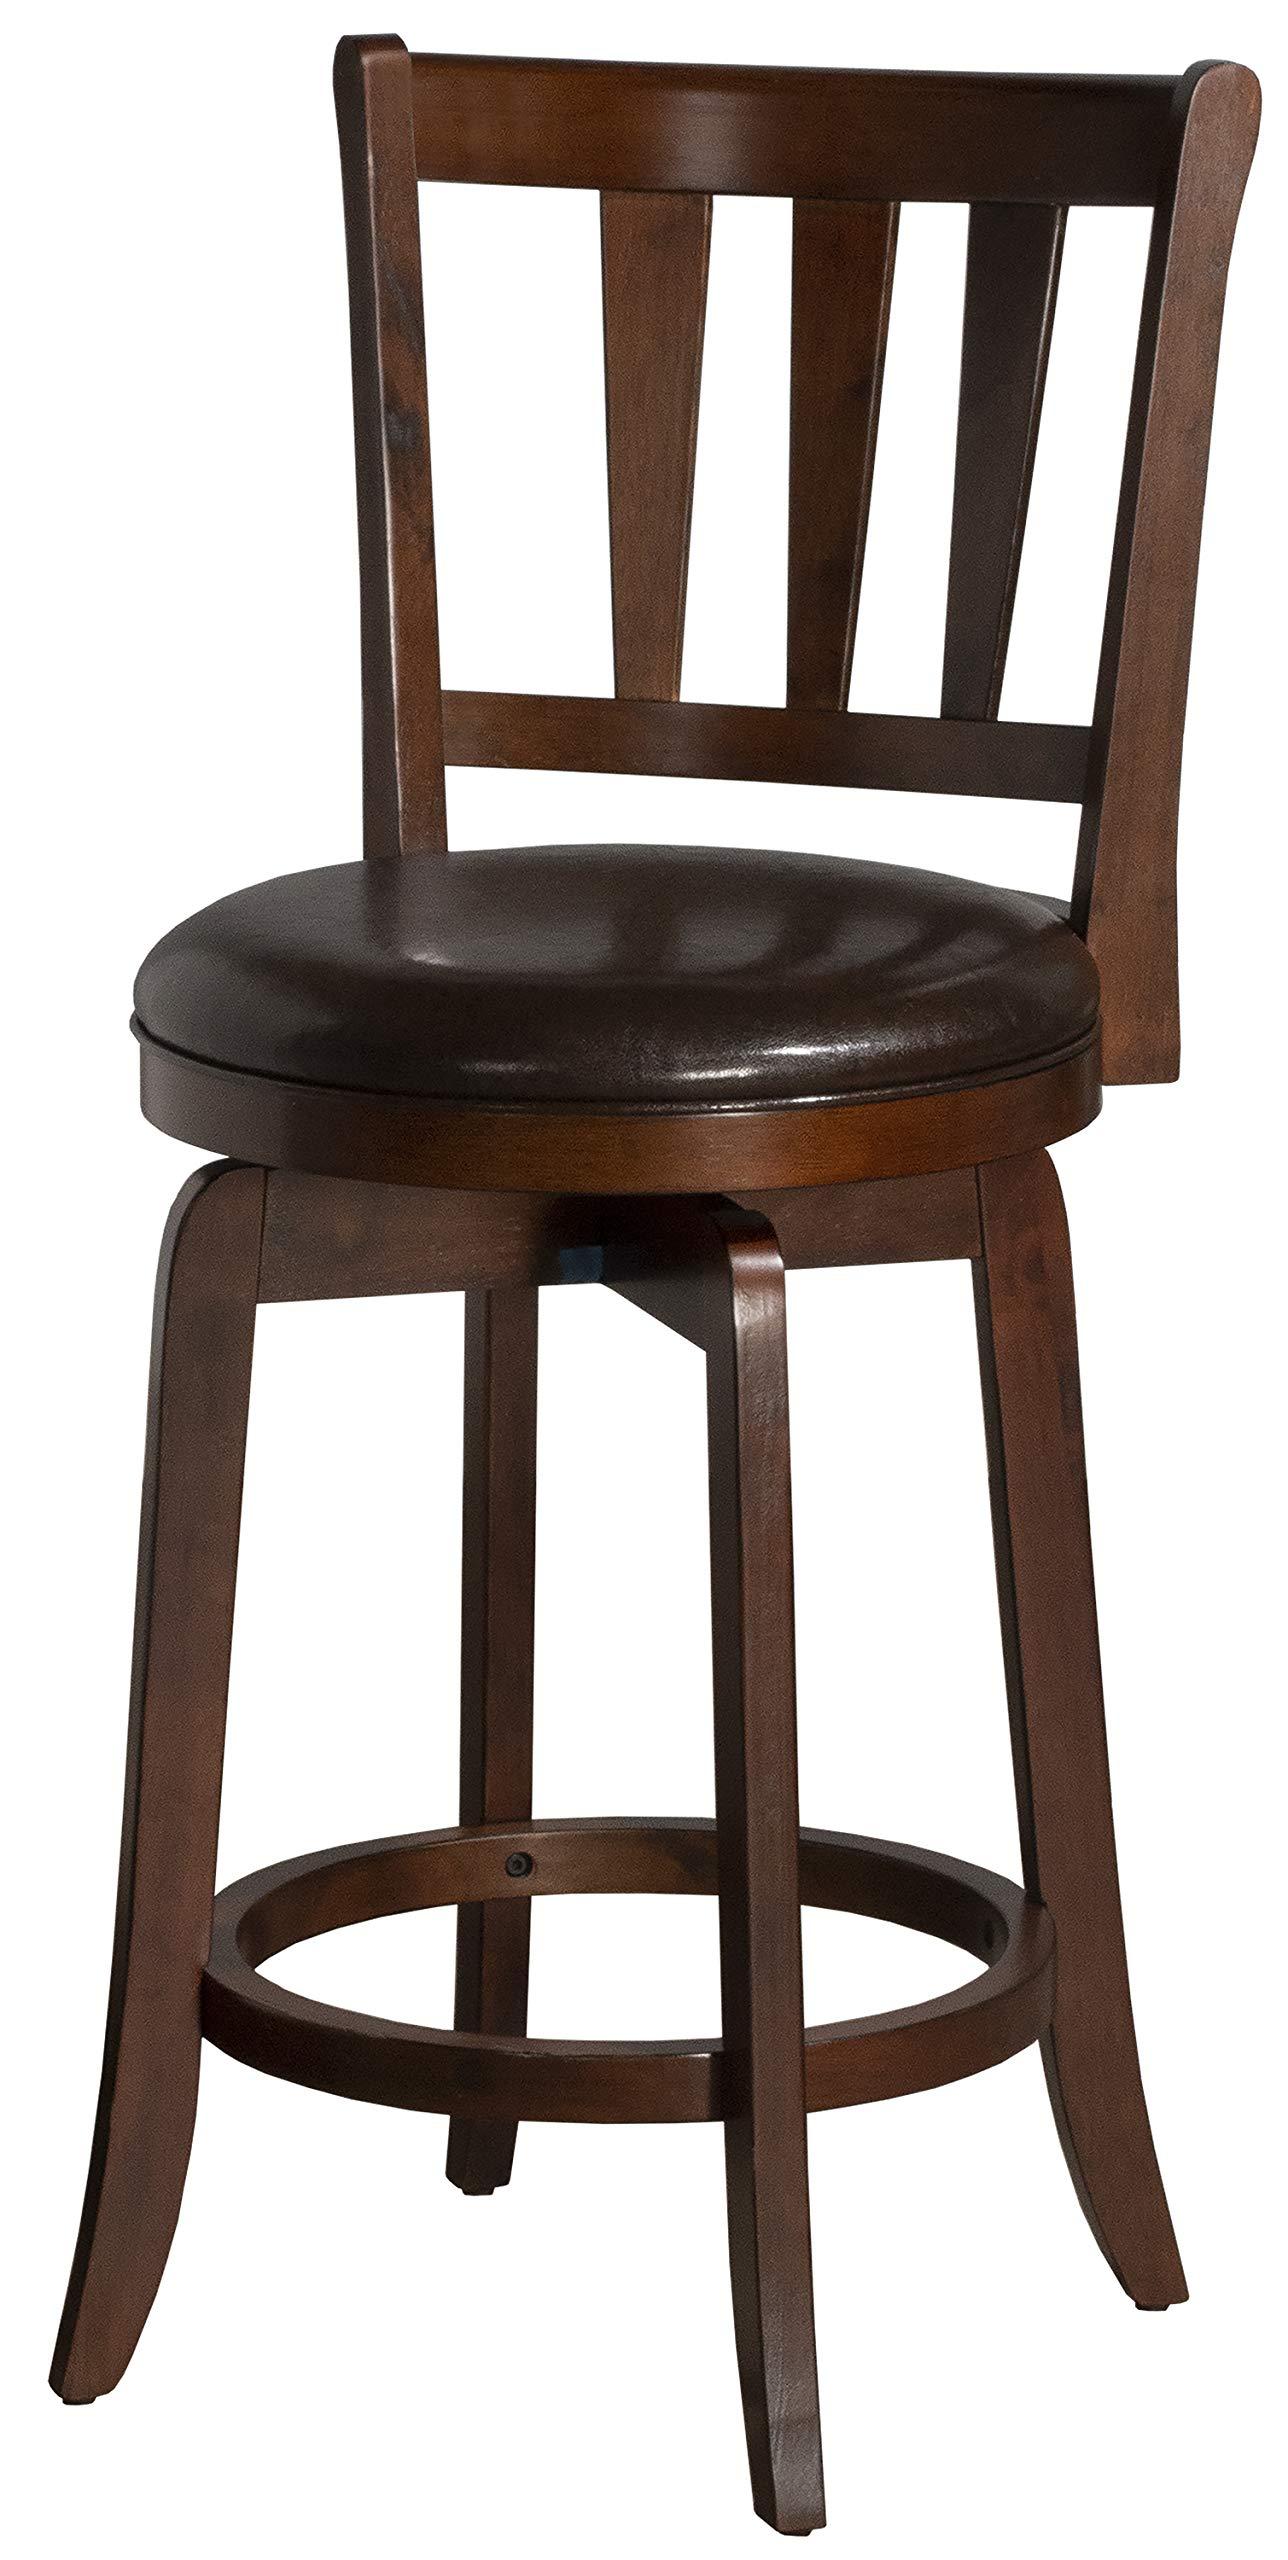 Hillsdale Presque Isle Swivel Bar Stool, Cherry by Hillsdale Furniture